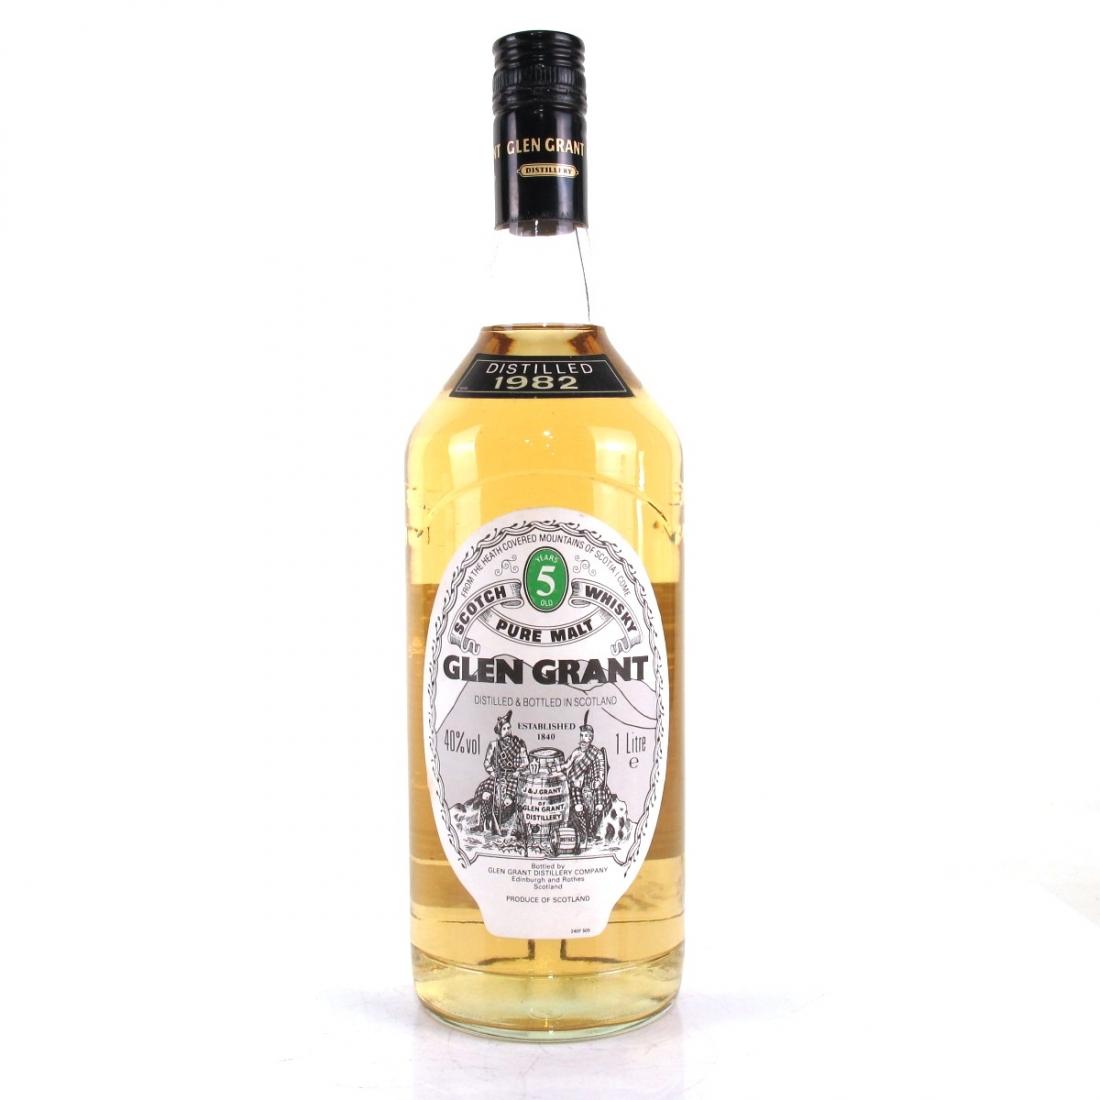 Glen Grant 1982 5 Year Old 1 Litre